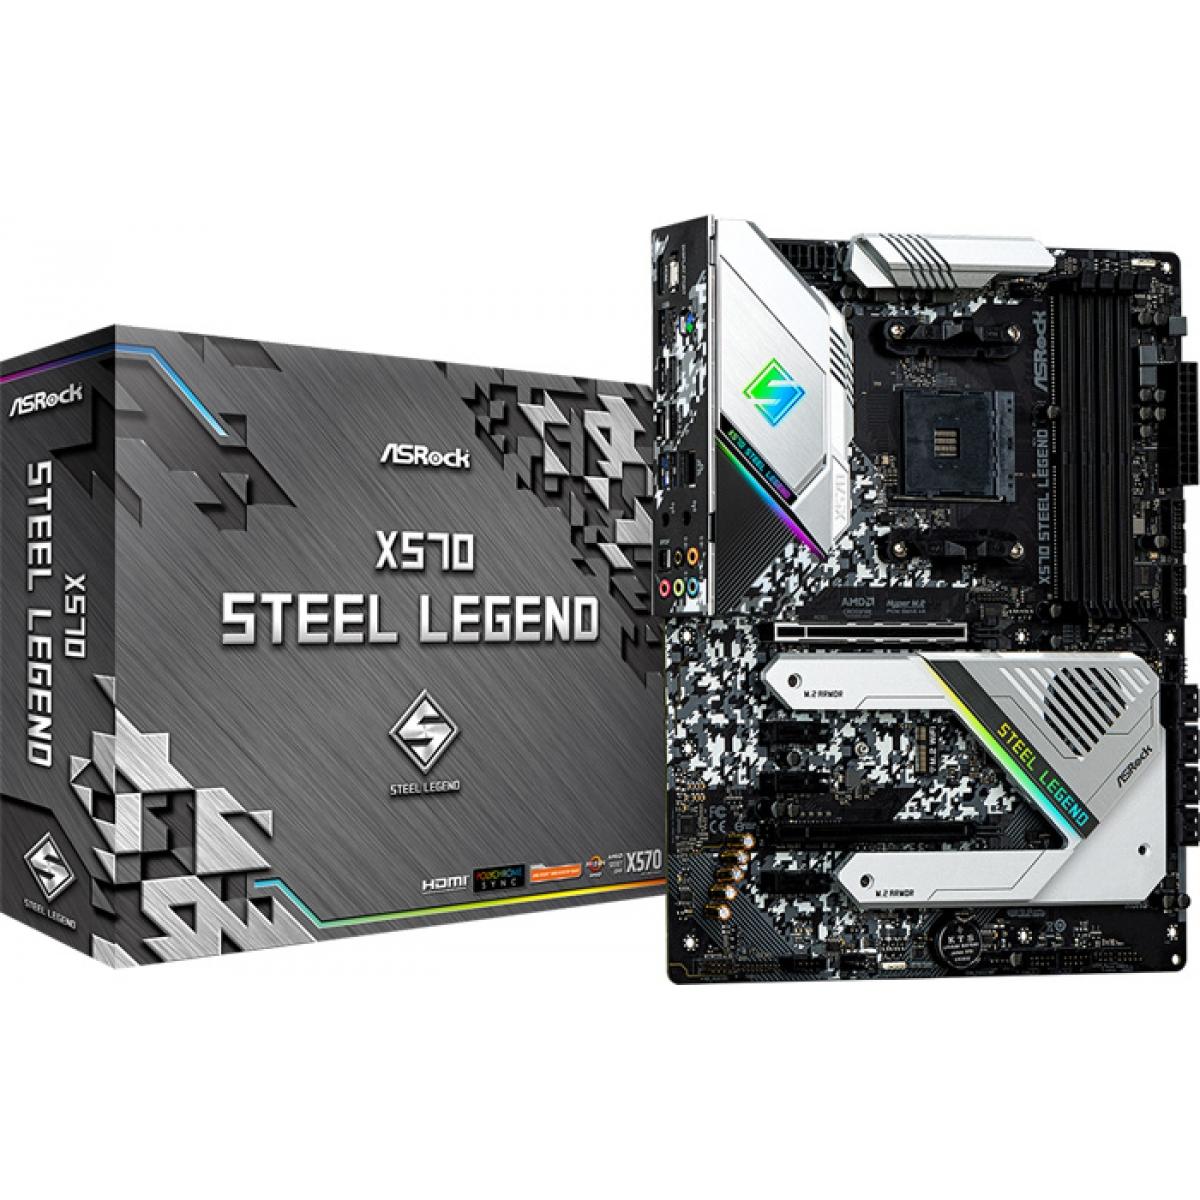 Placa Mãe ASRock X570 Steel Legend, Chipset X570, AMD AM4, ATX, DDR4